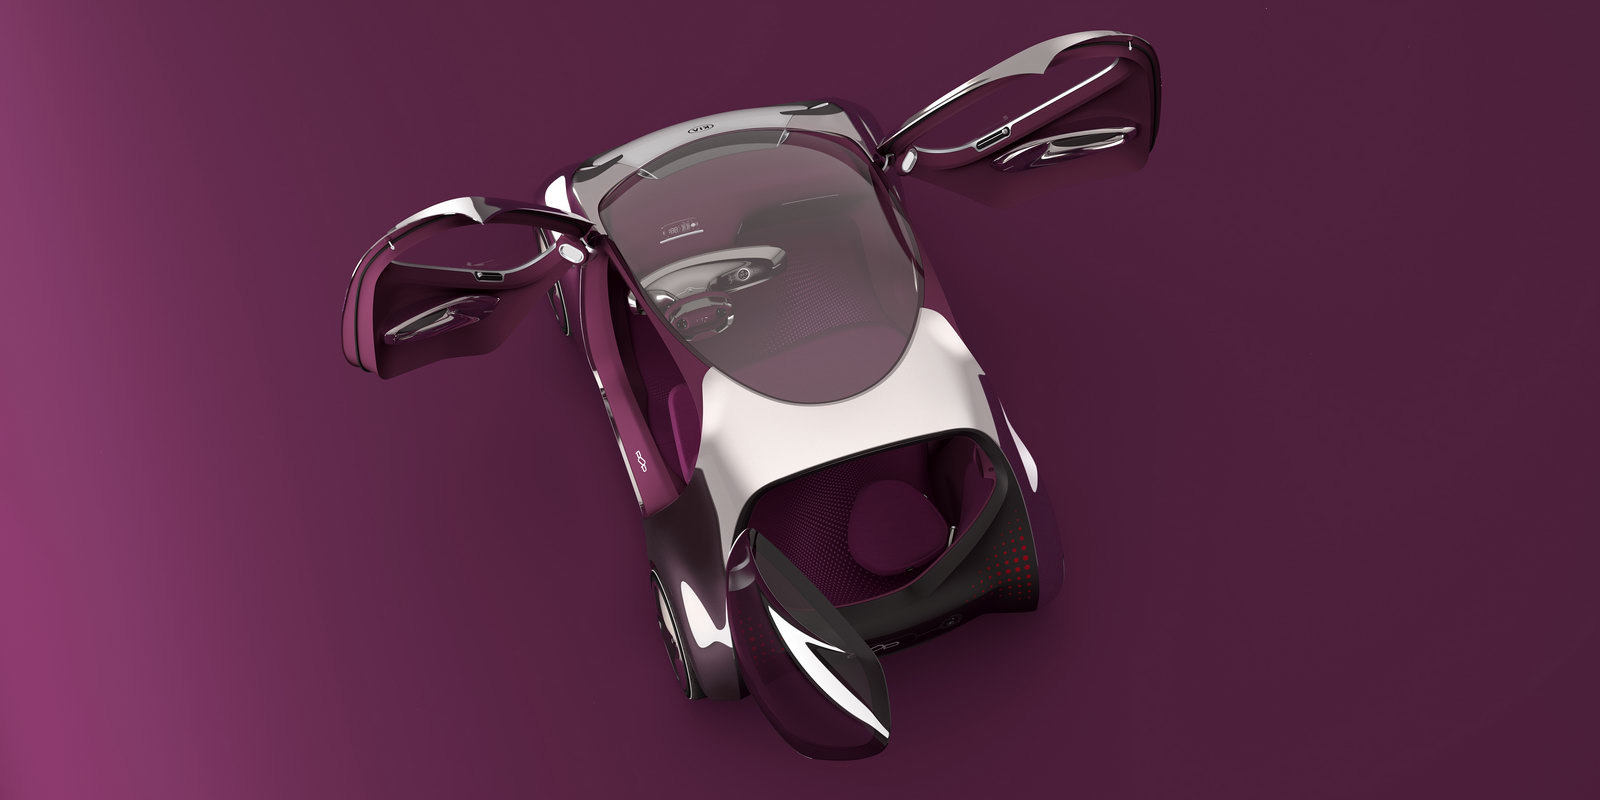 kia_pop_electric_vehicle_concept_14